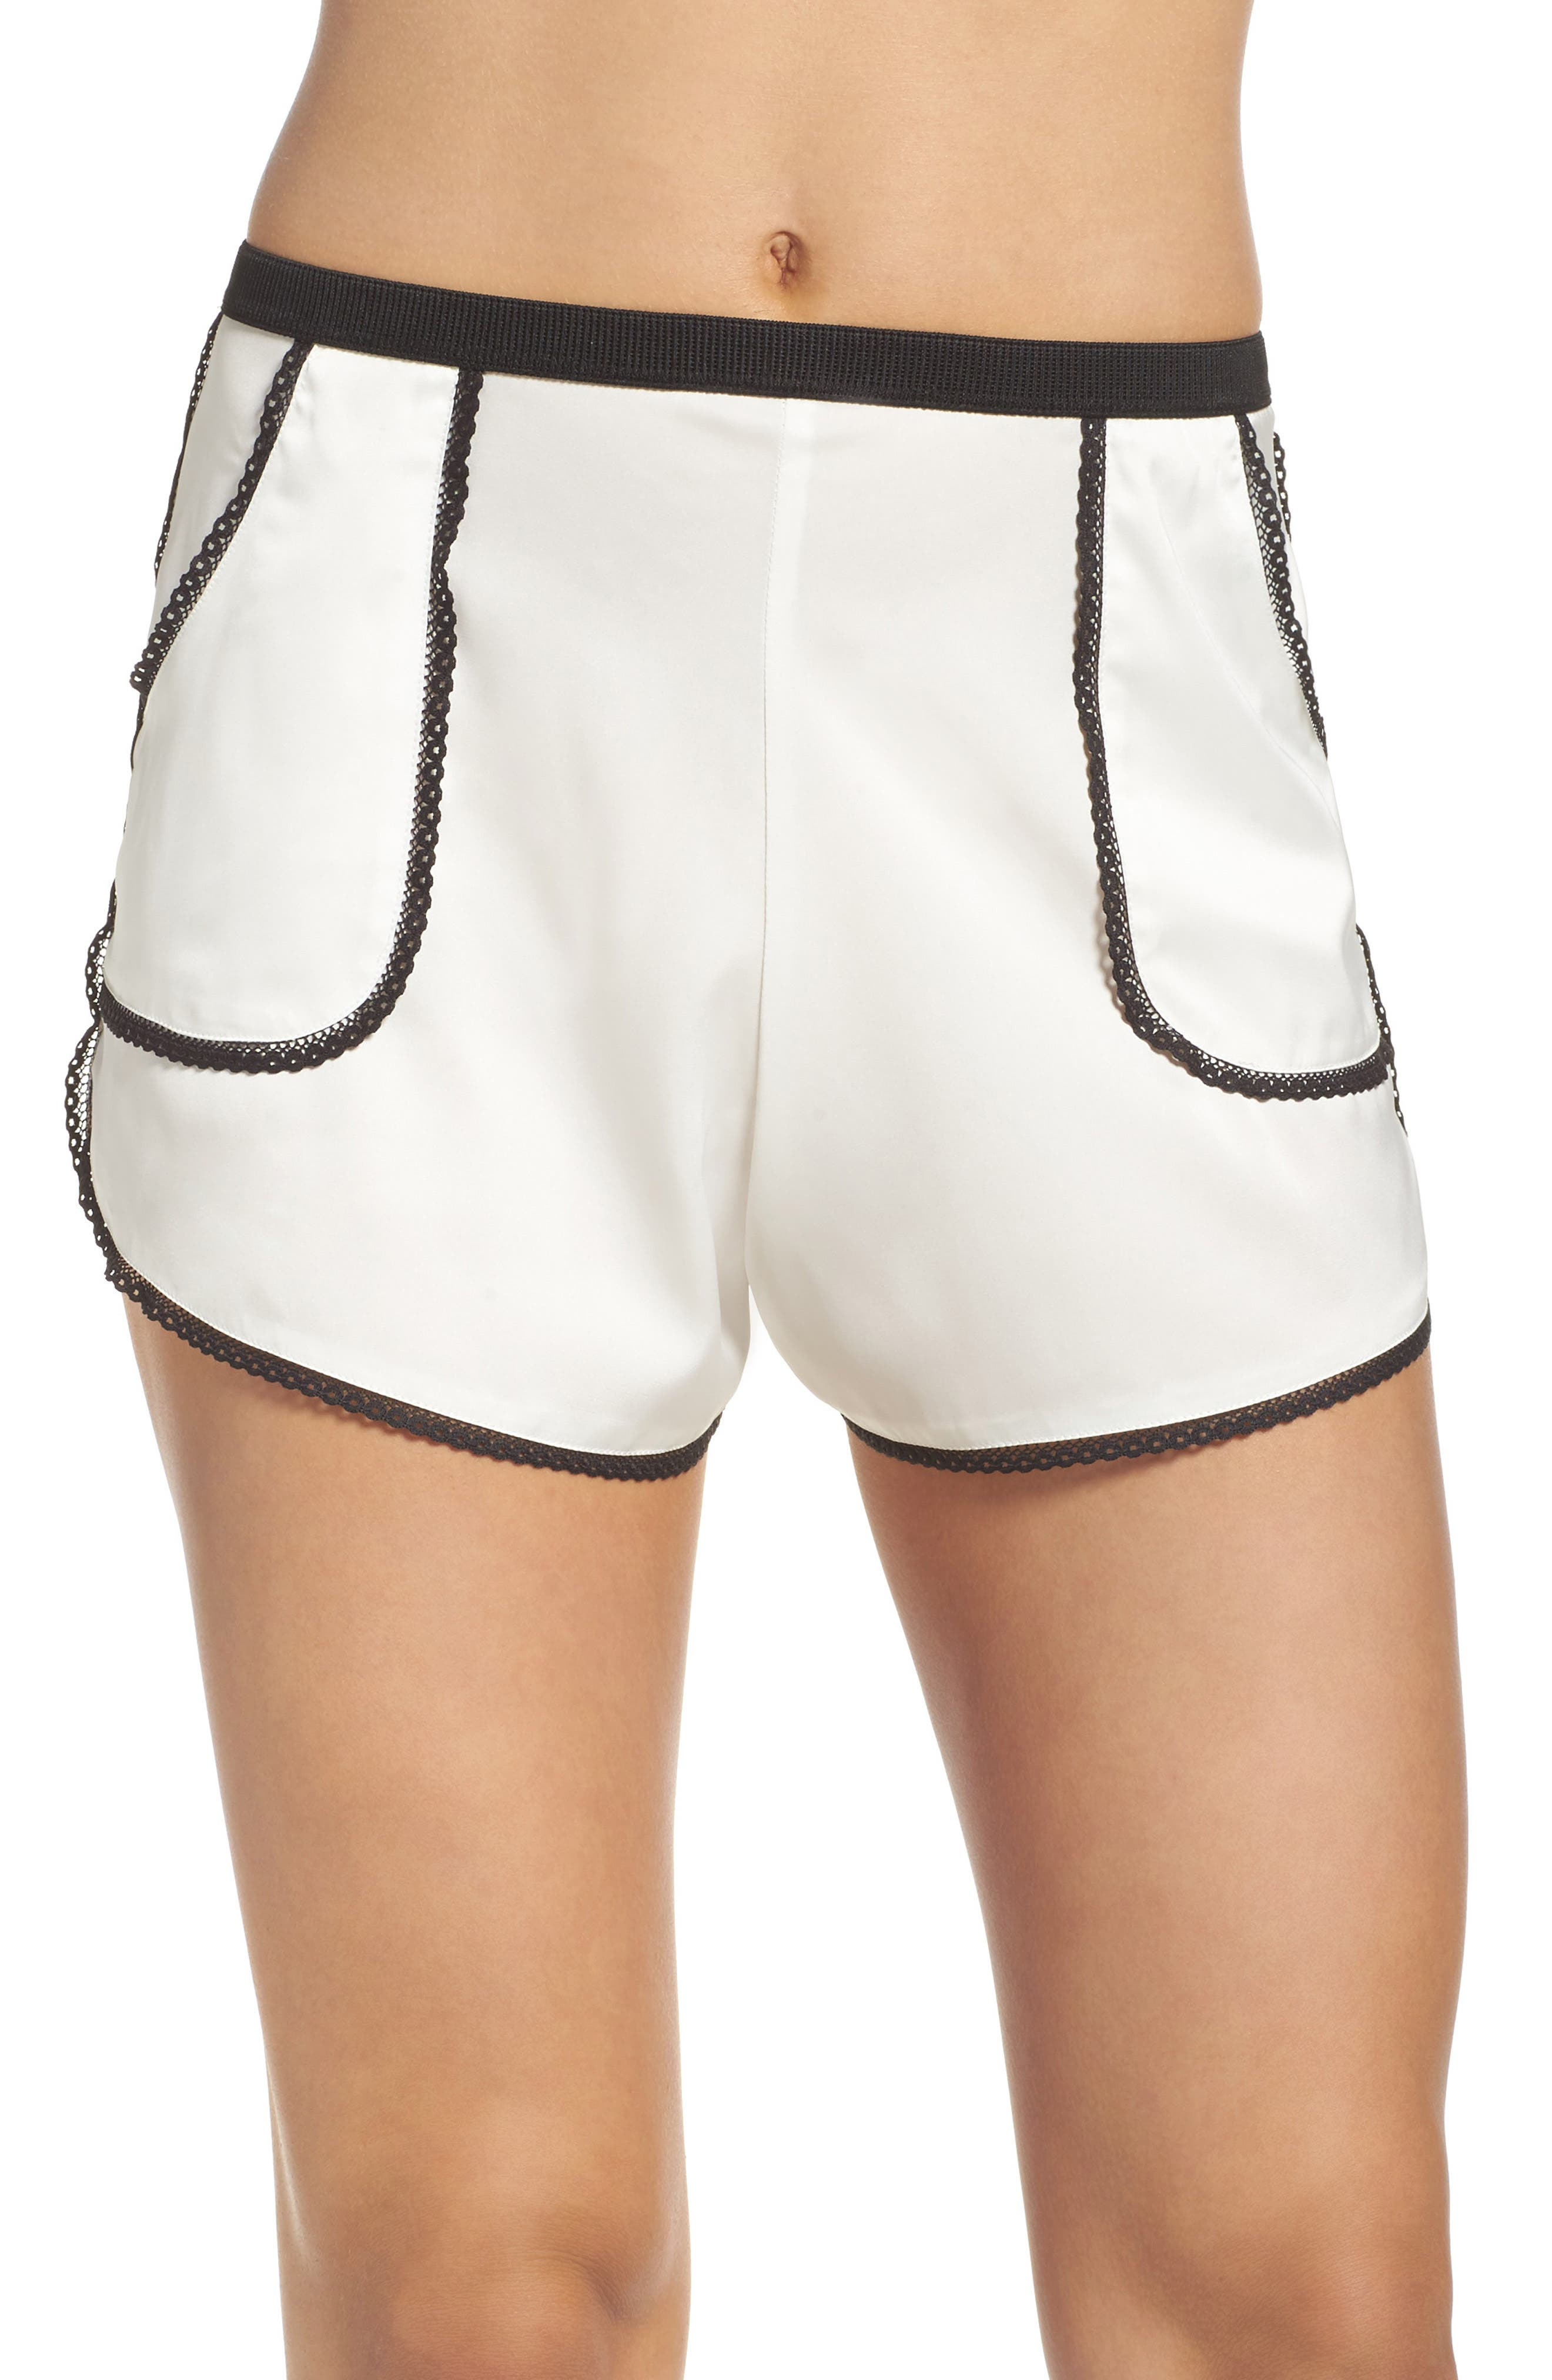 Thistle & Spire Devoe Satin Pajama Shorts,                         Main,                         color, 900